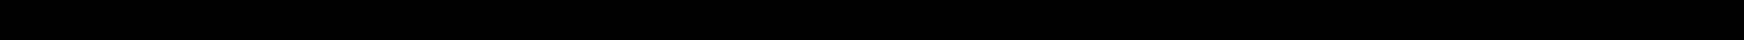 MetaPro-CondXboldIta.otf